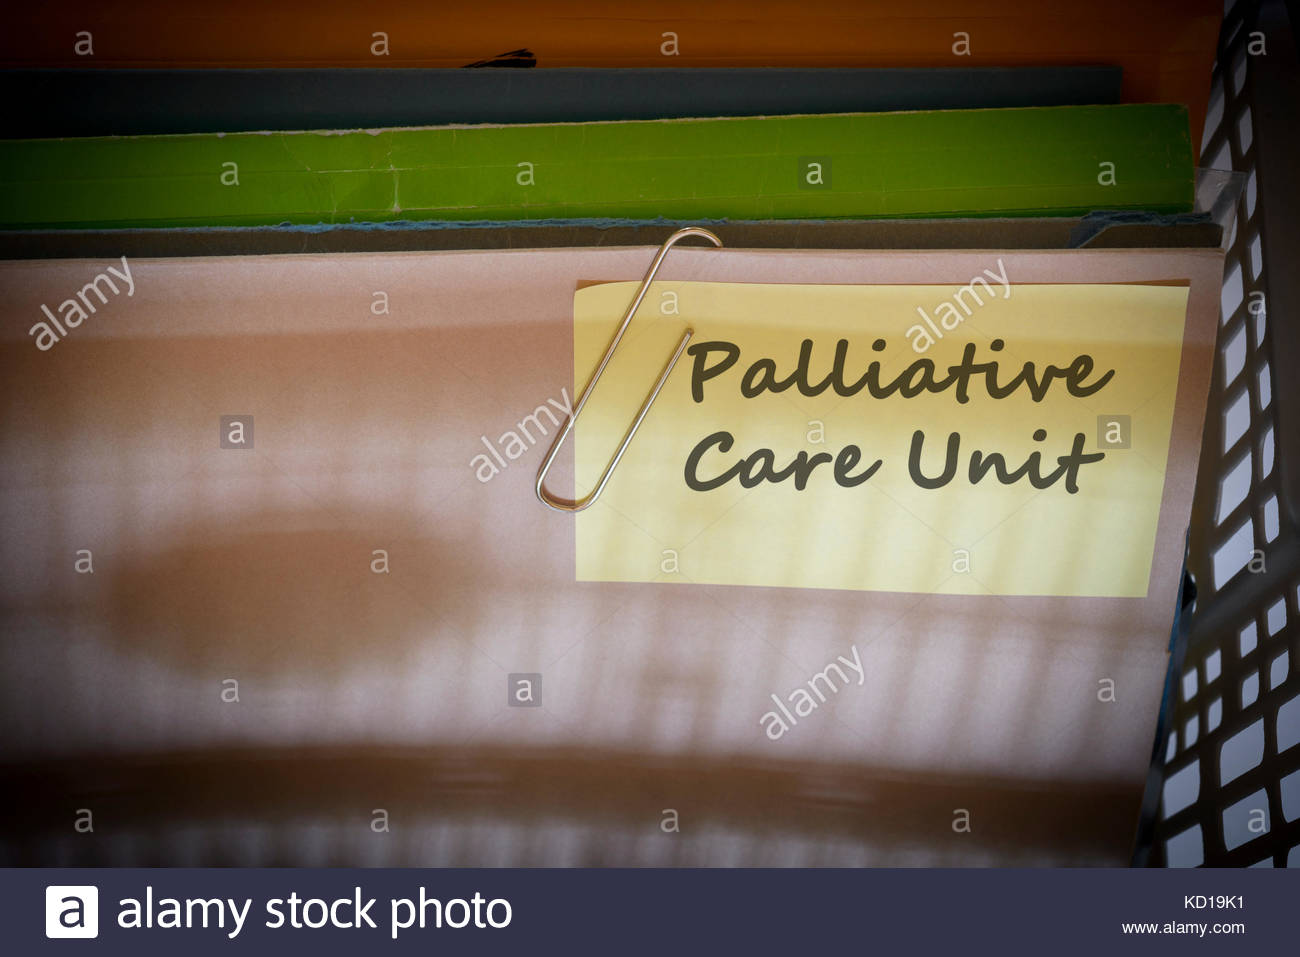 Palliative Care Unit written on document folder, Dorset, England. - Stock Image